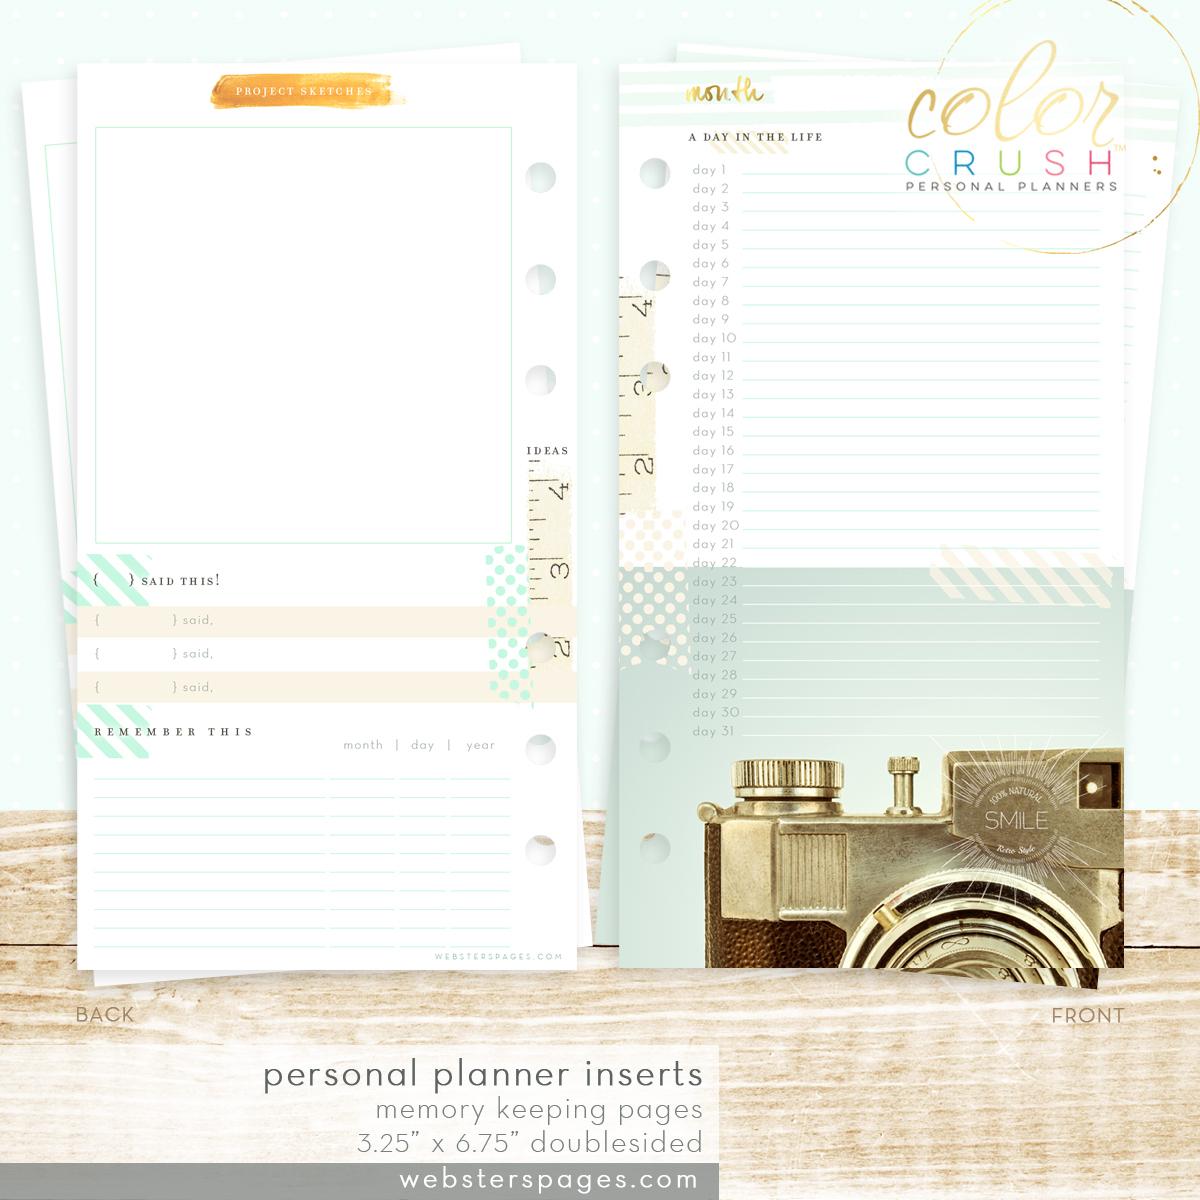 Планер с наполнением. Не датирован.-PERSONAL PLANNER KIT  by Websters Pages -Teal/White